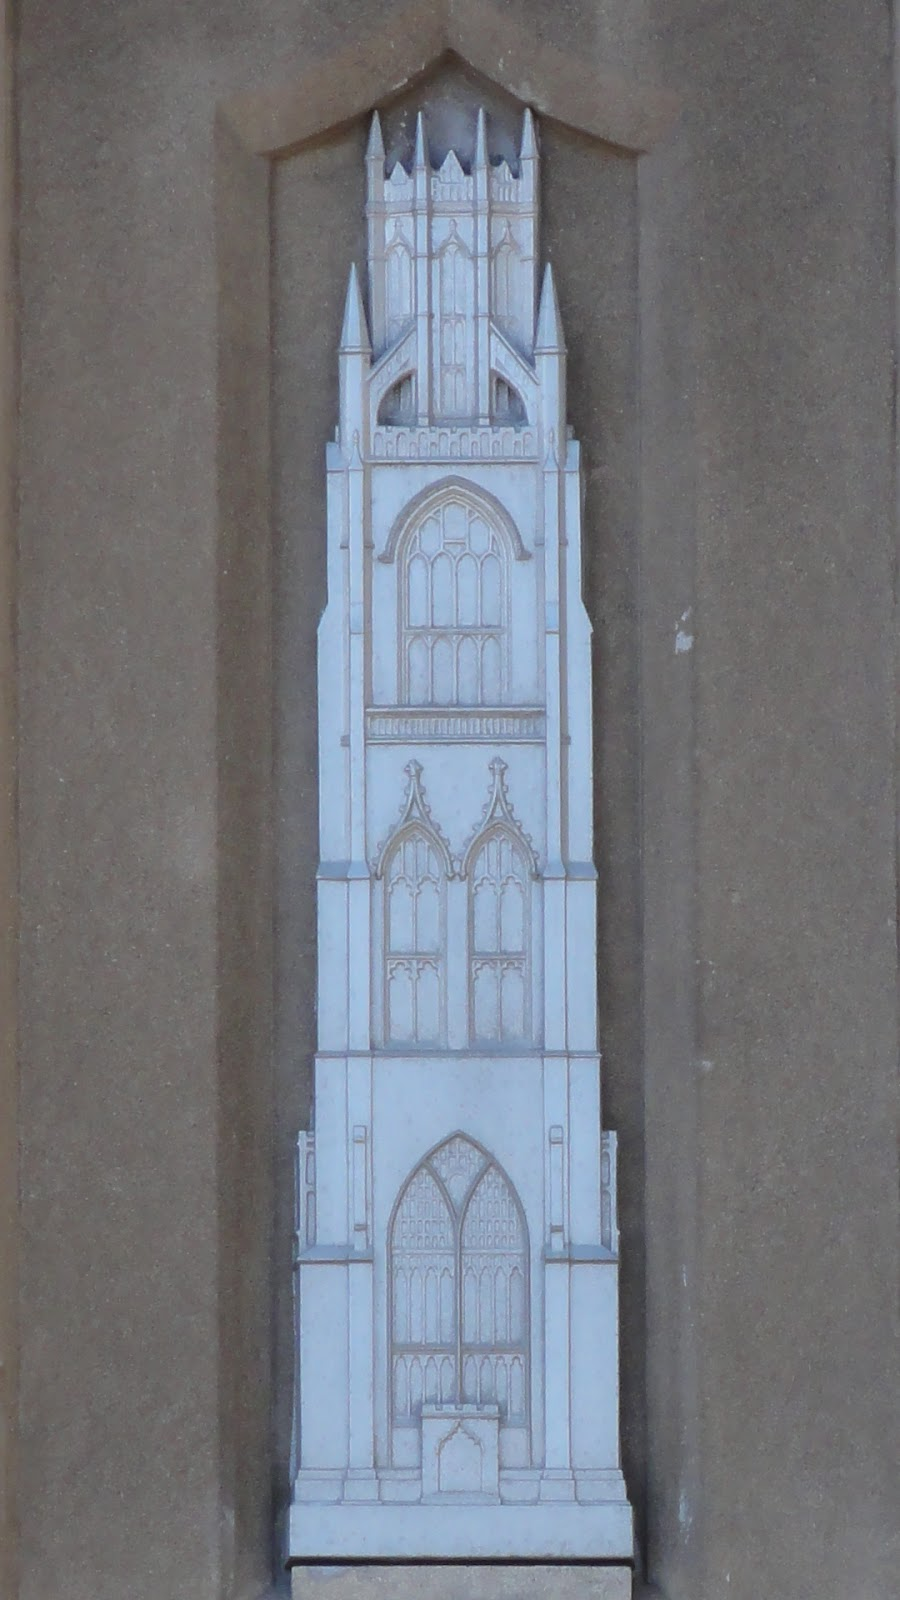 ArchiTalk: The tower that stumped Boston